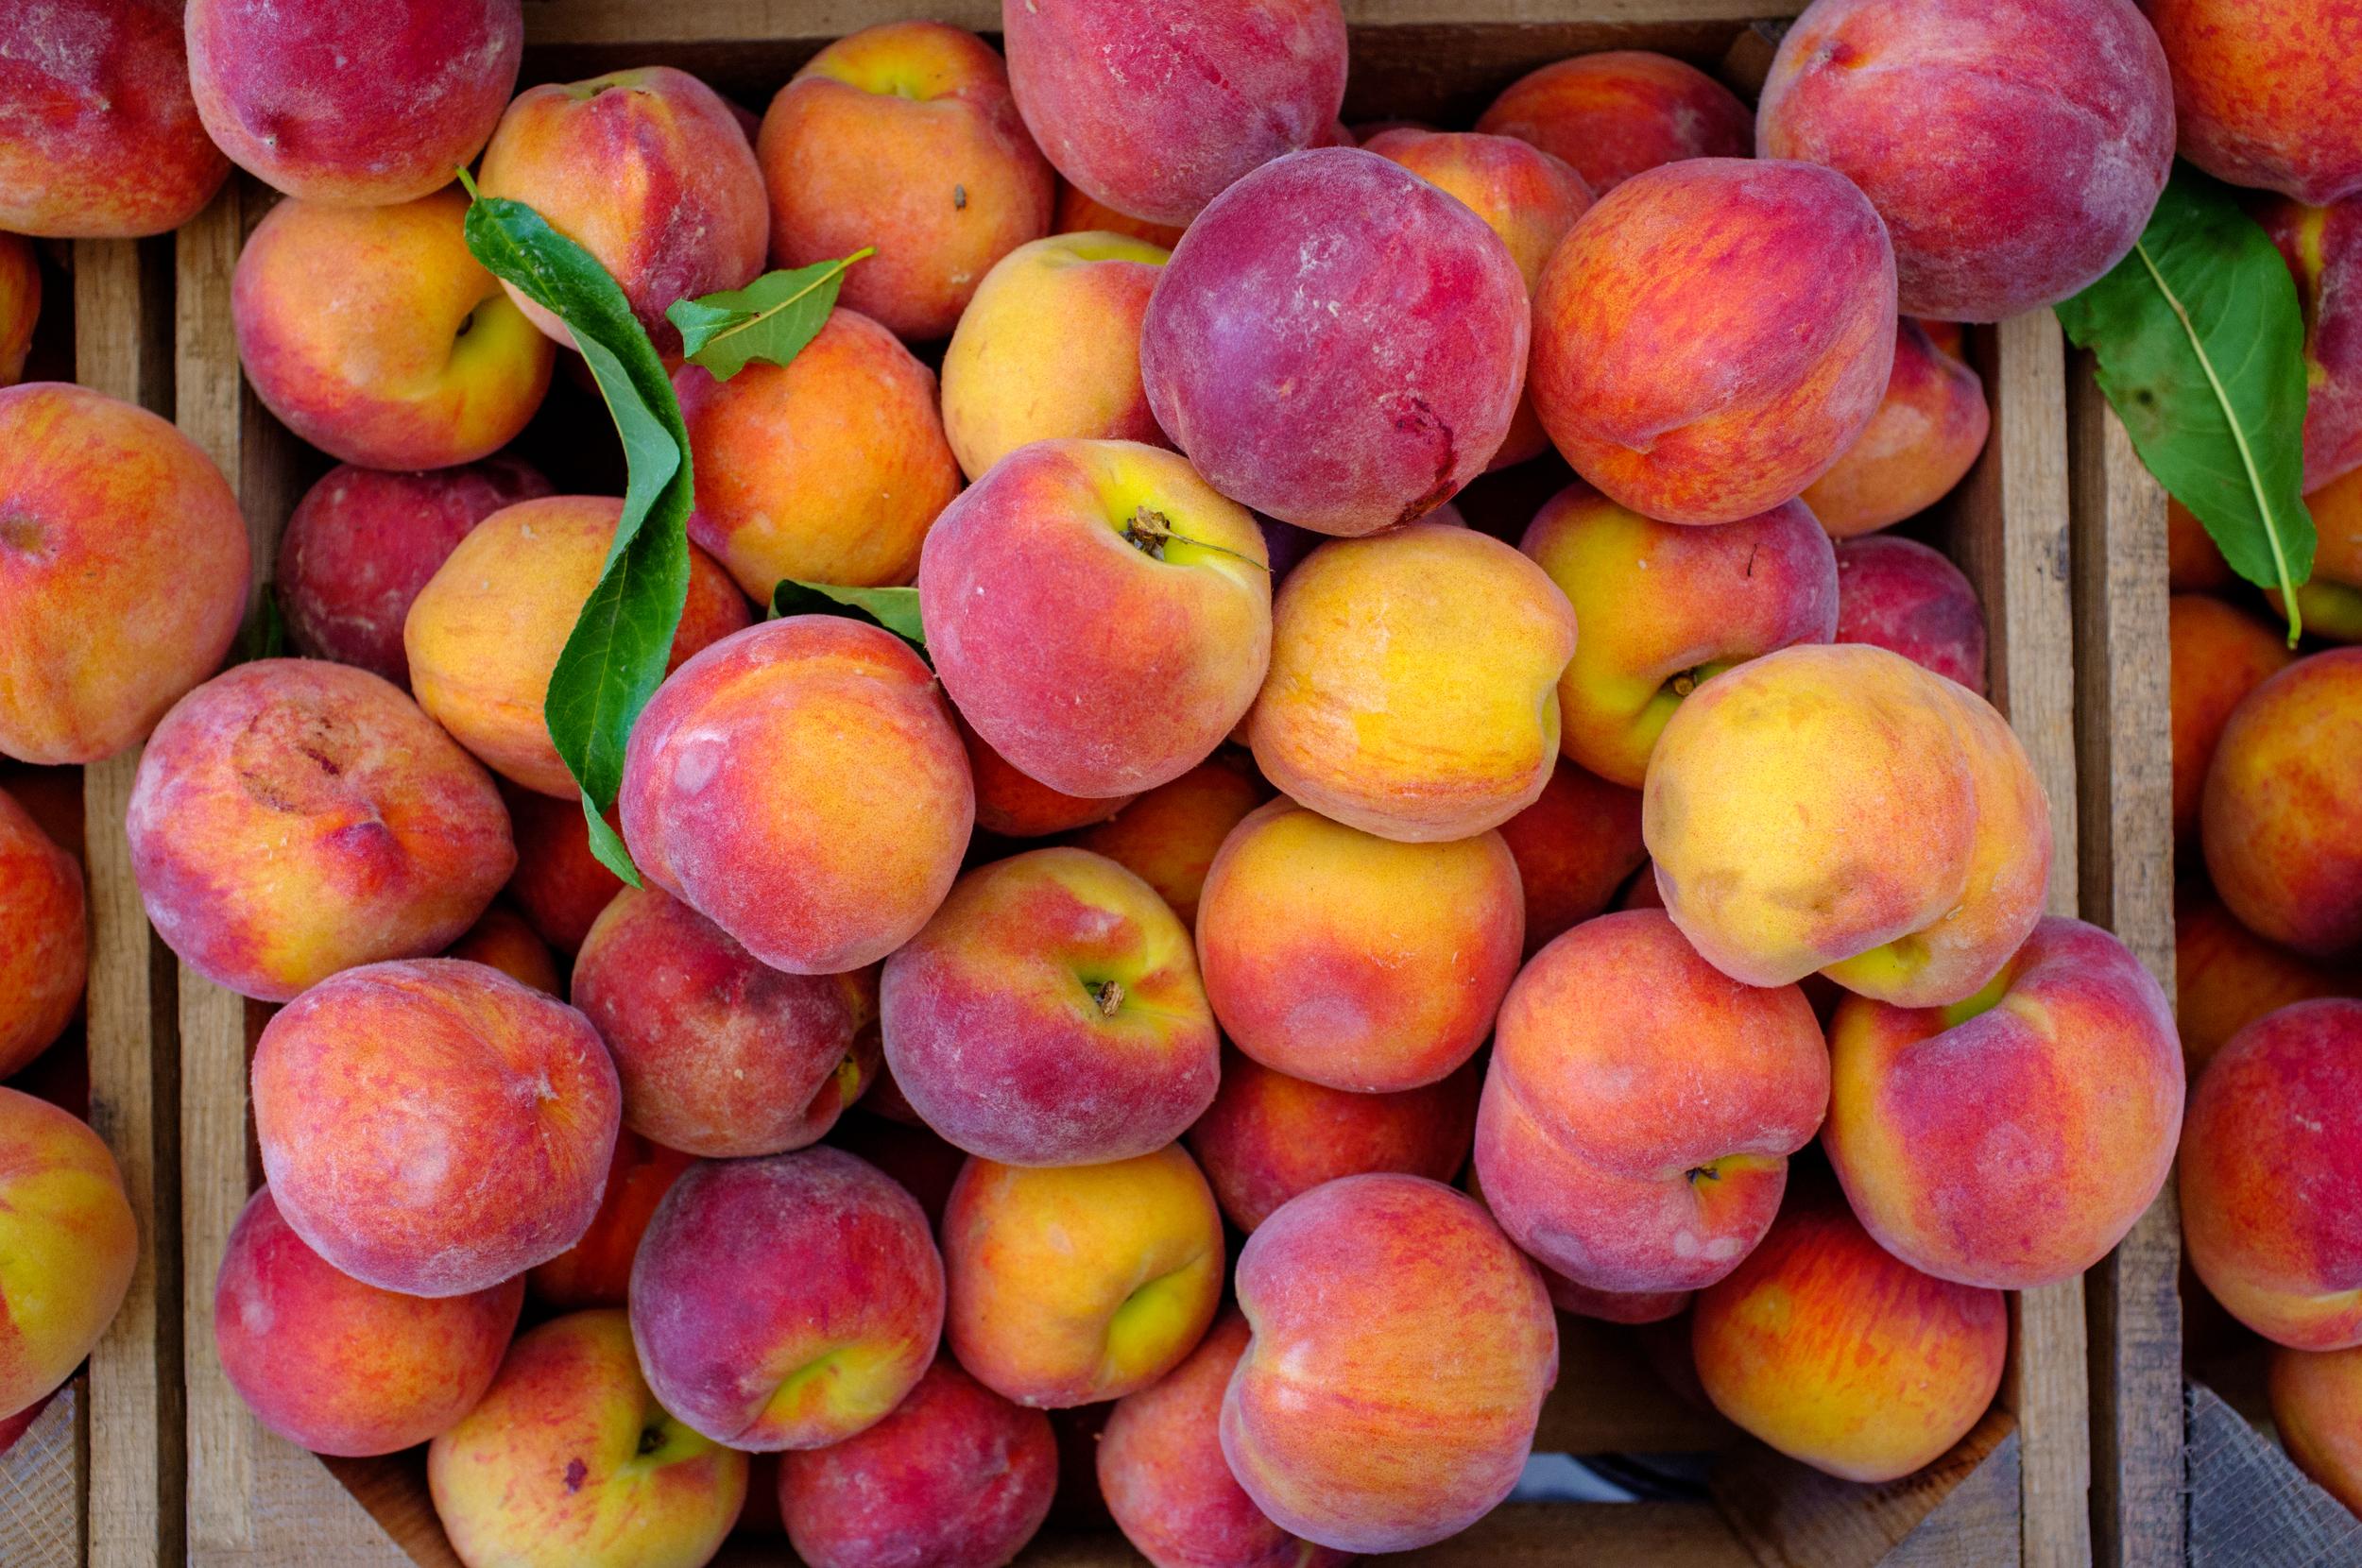 Peaches from Toigo Orchards